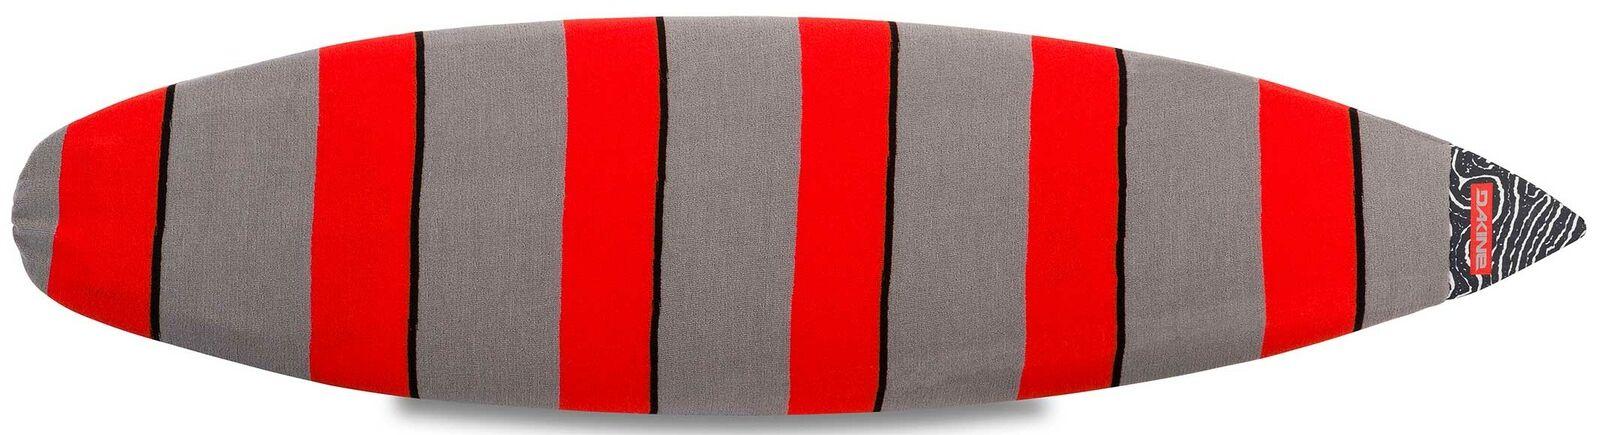 DaKine Knit Bag Thruster - Lava Tubes - 7' - New